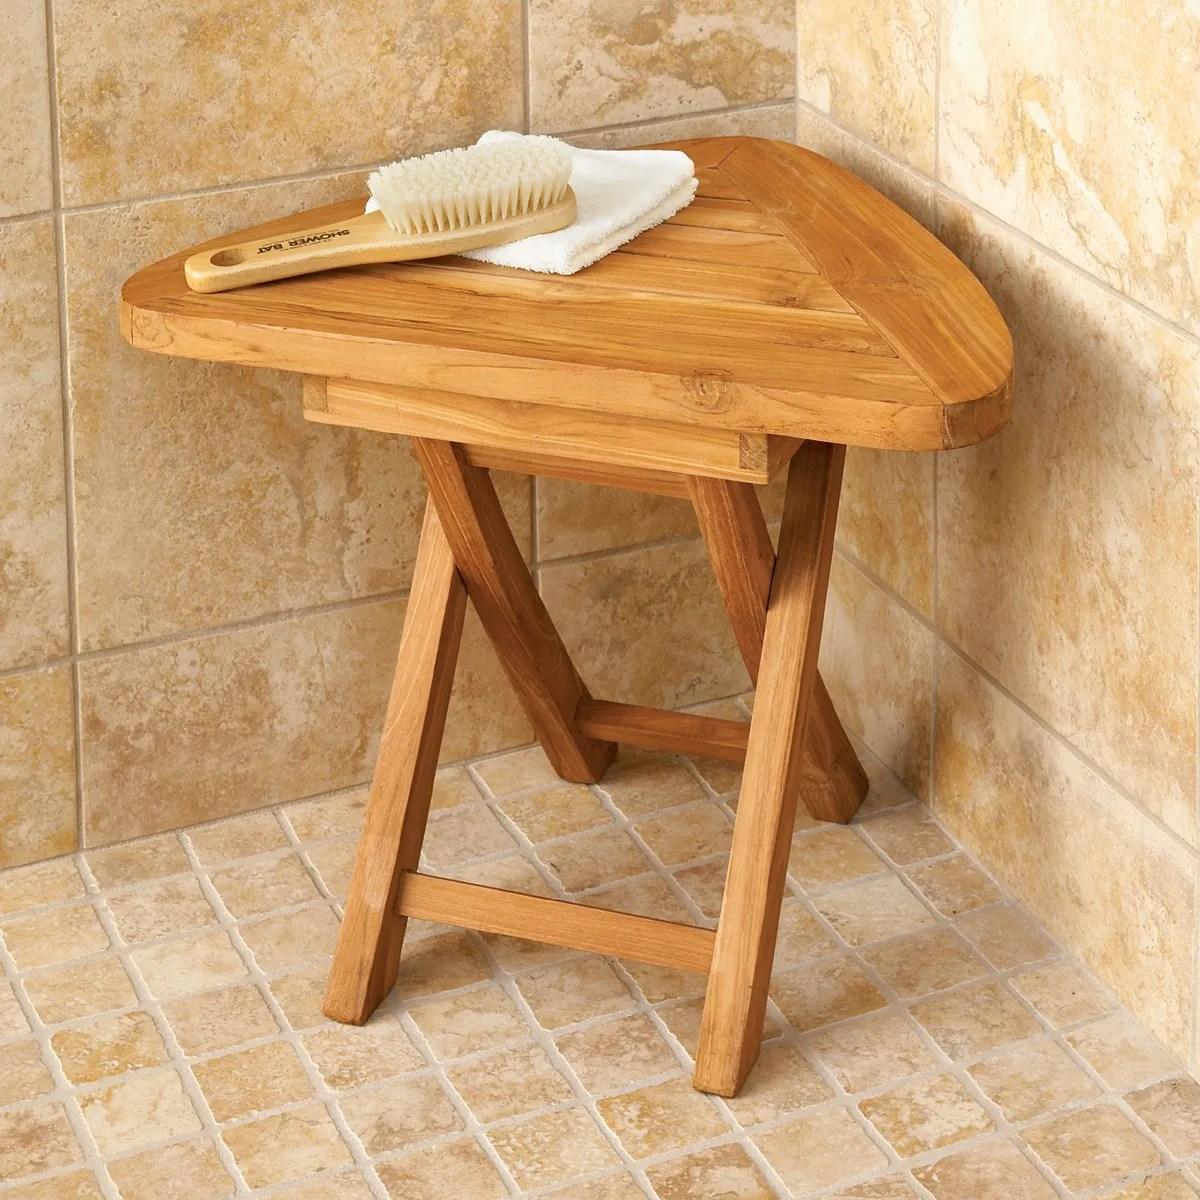 Teak Corner Bath Stool  from Sportys Preferred Living